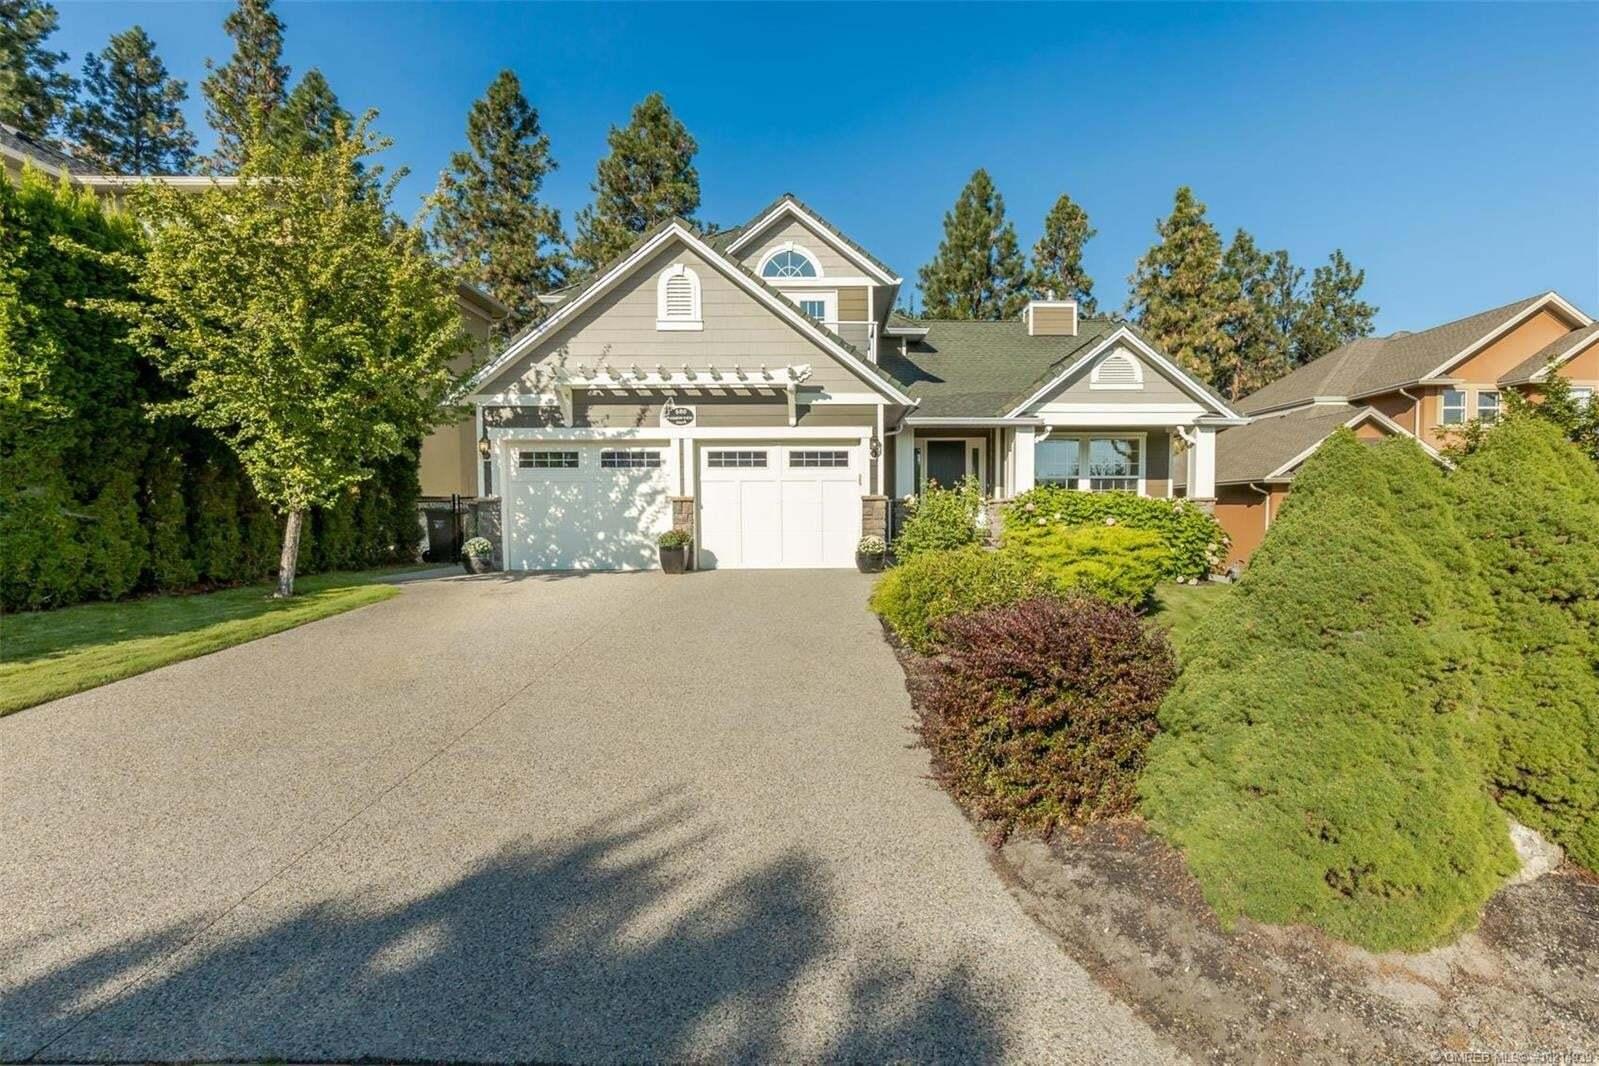 House for sale at 590 Arbor View Dr Kelowna British Columbia - MLS: 10214939